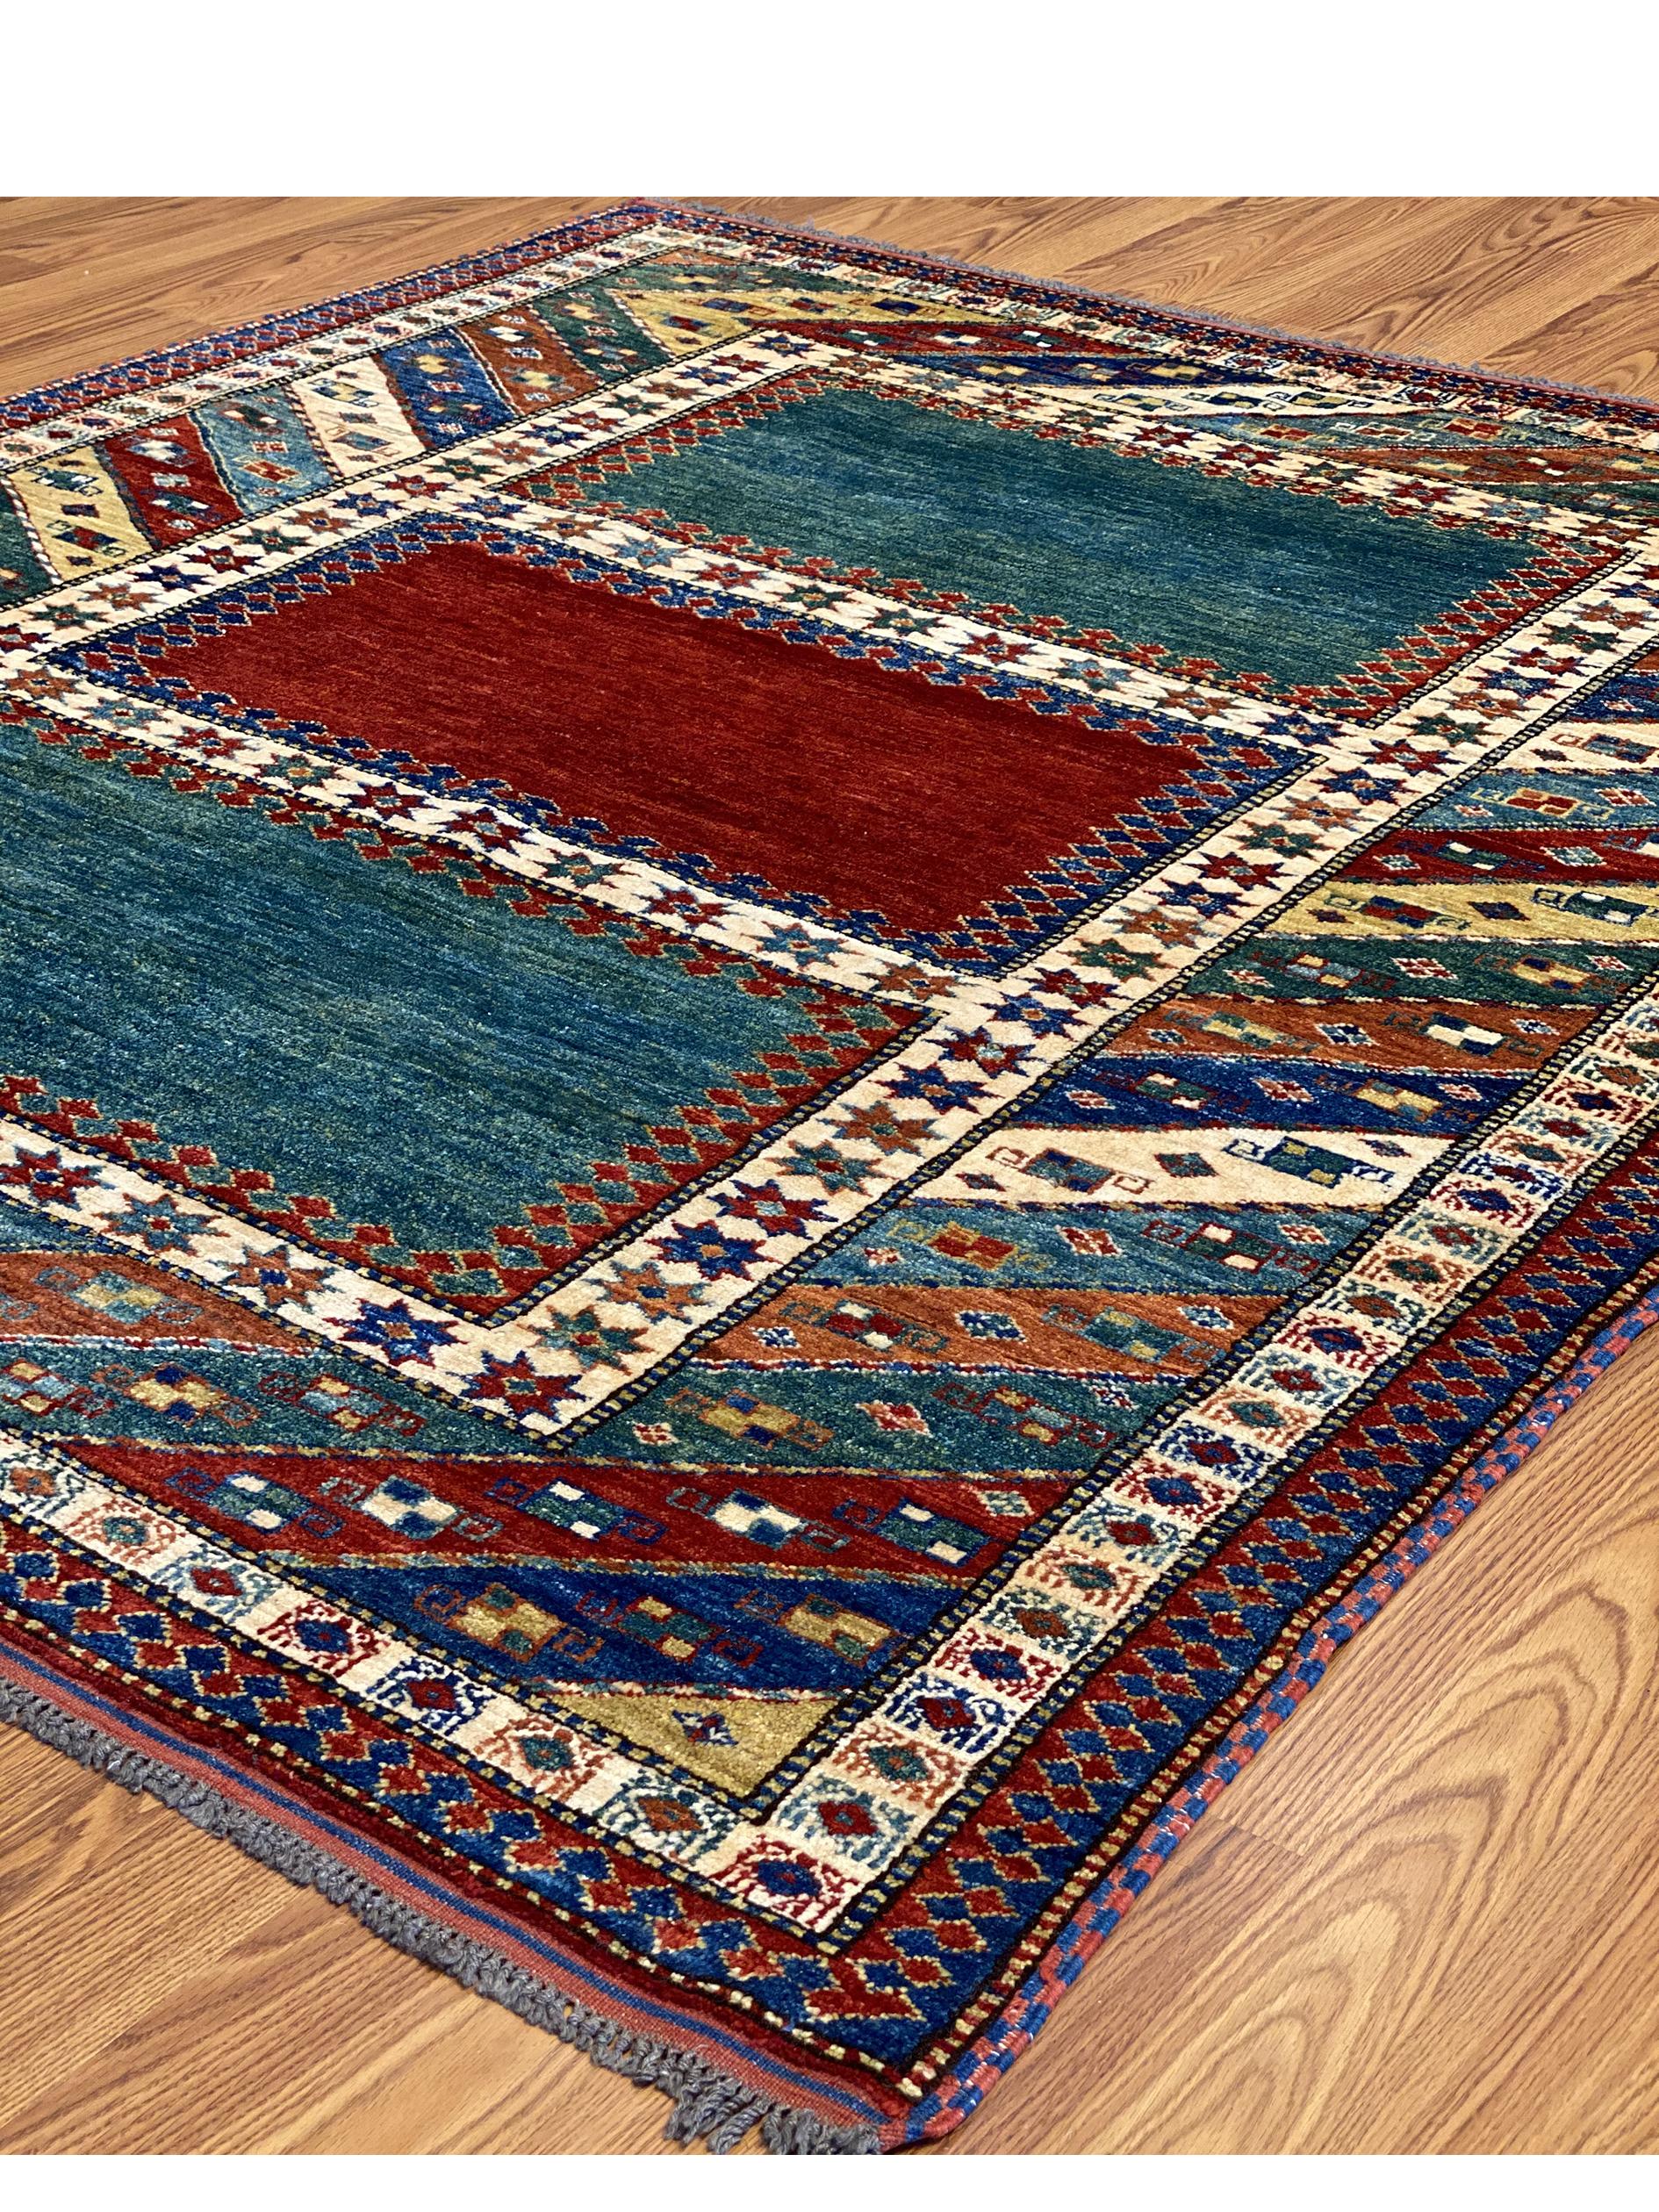 Caucasion 5' x 6' Handmade Area Rug - Shabahang Royal Carpet